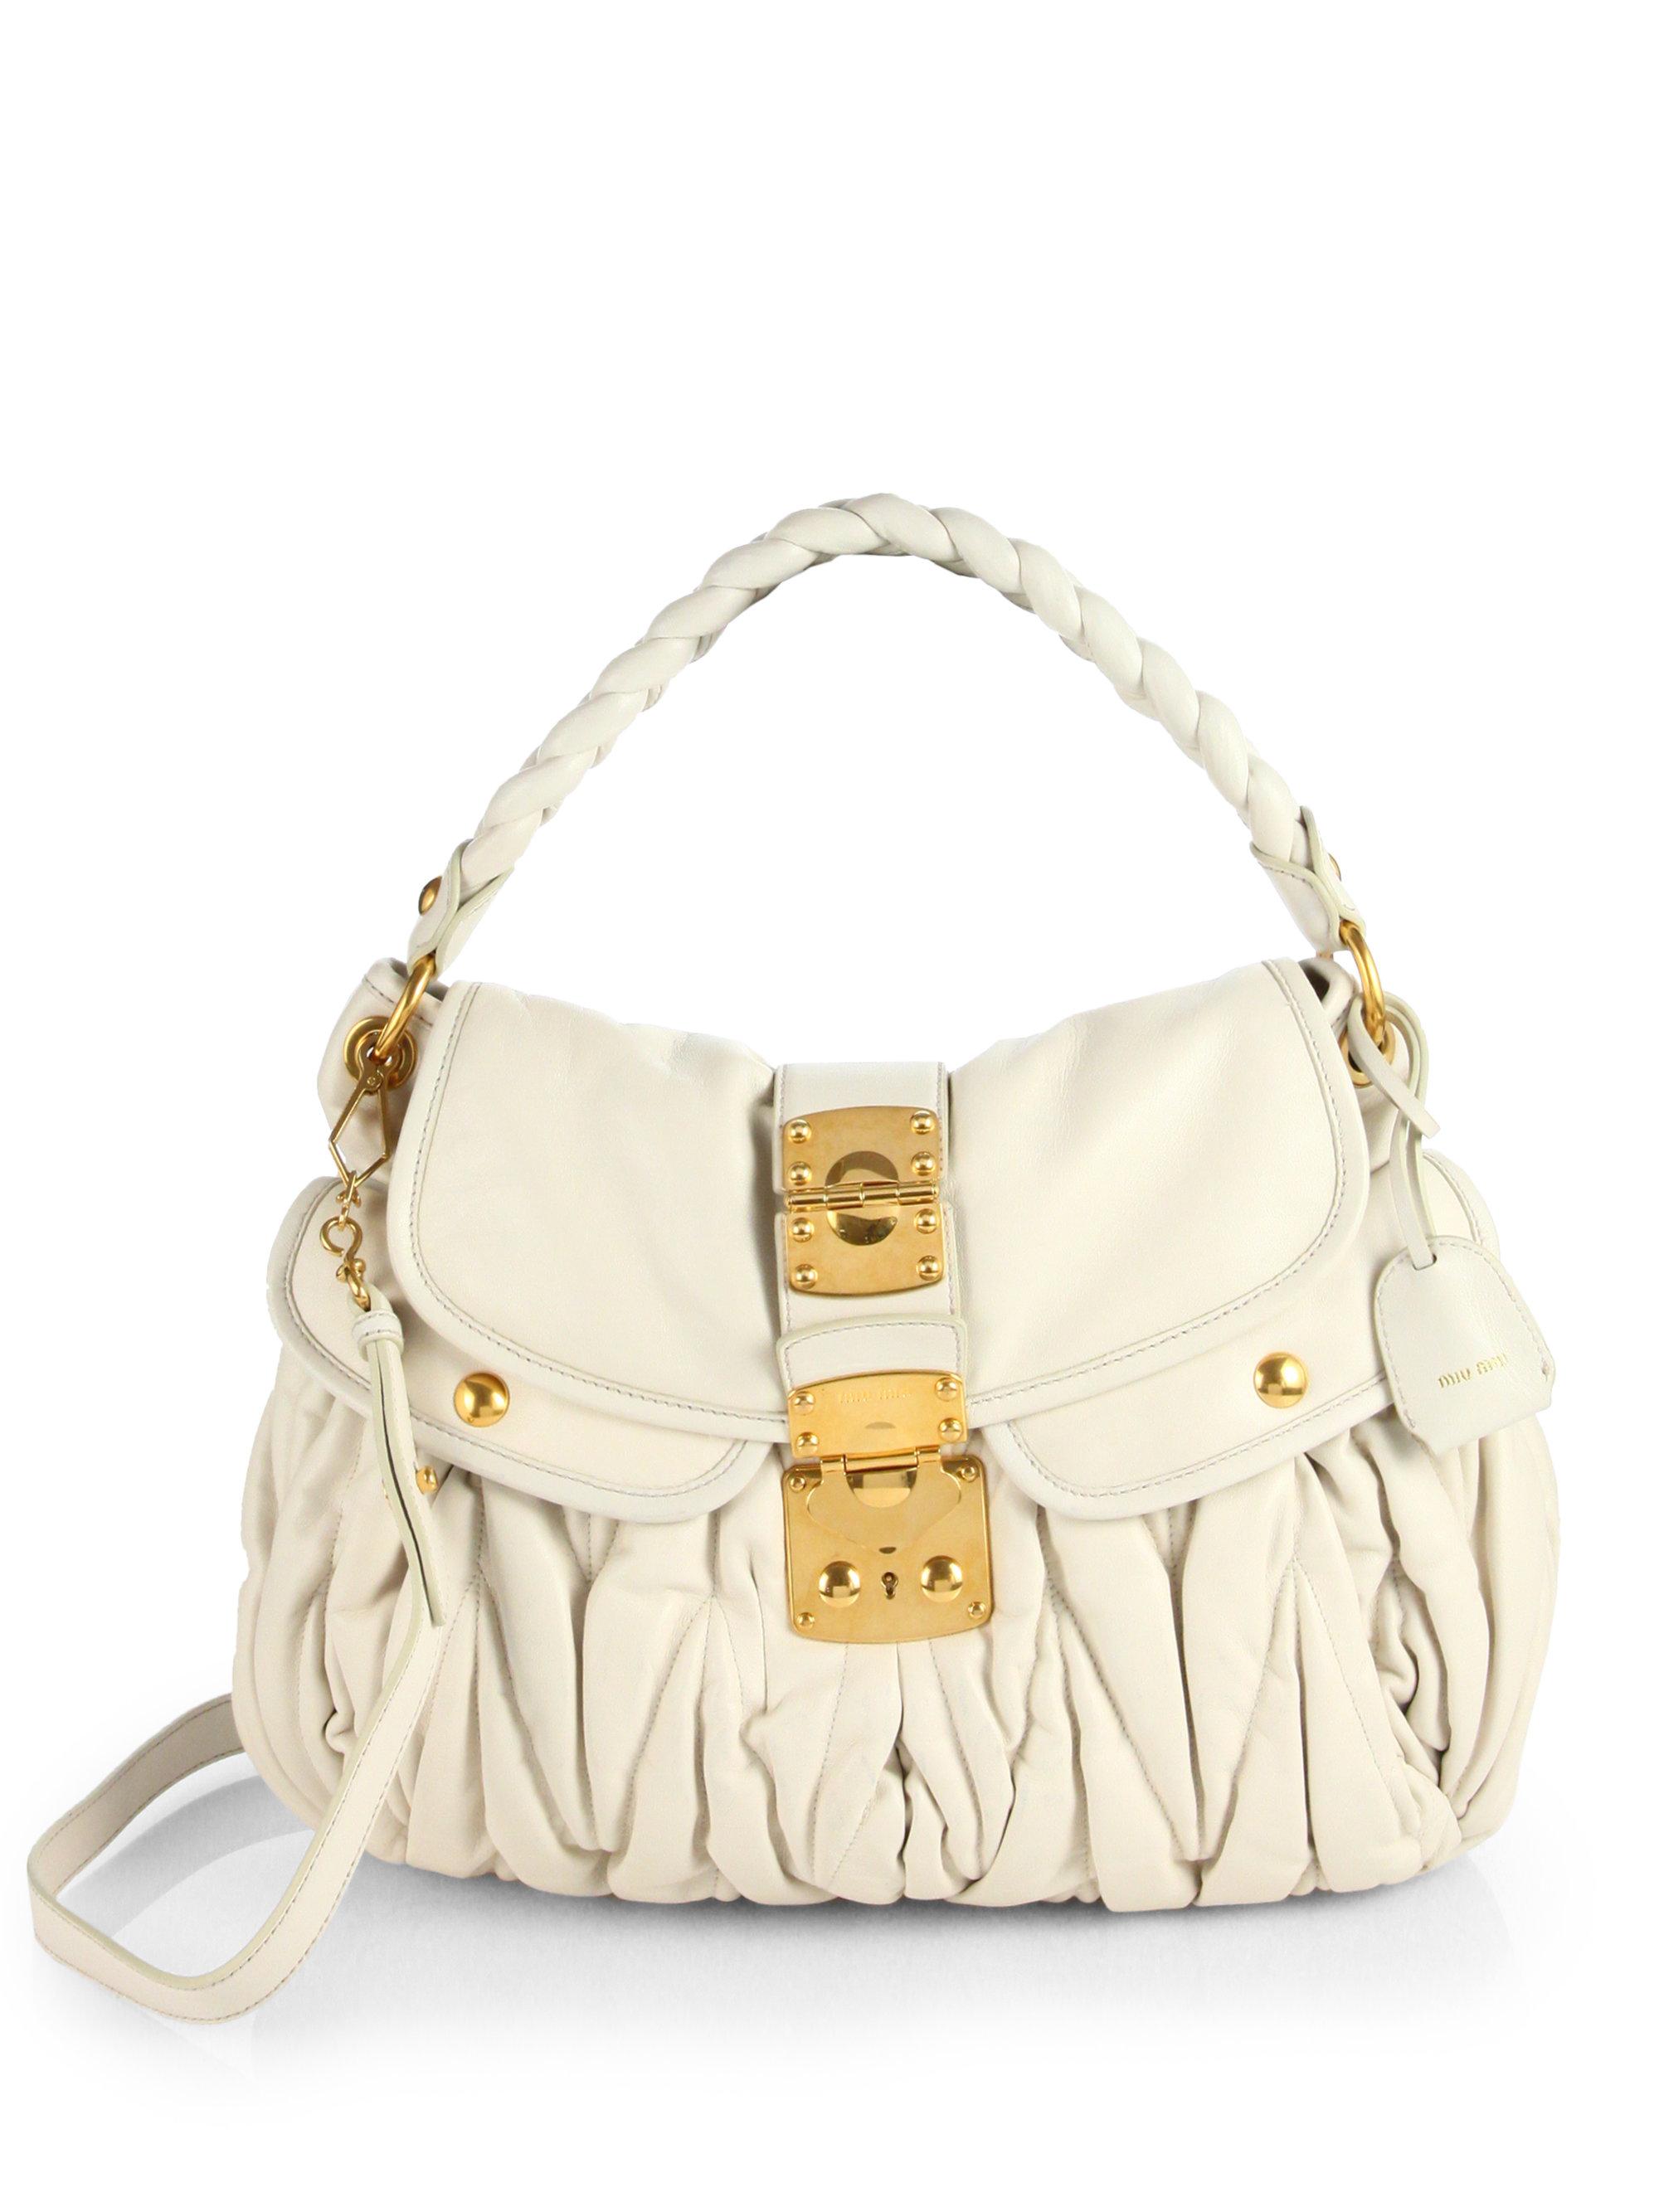 Miu Miu Matelasse Leather Shoulder Bag in White - Lyst 92416633fe5b0